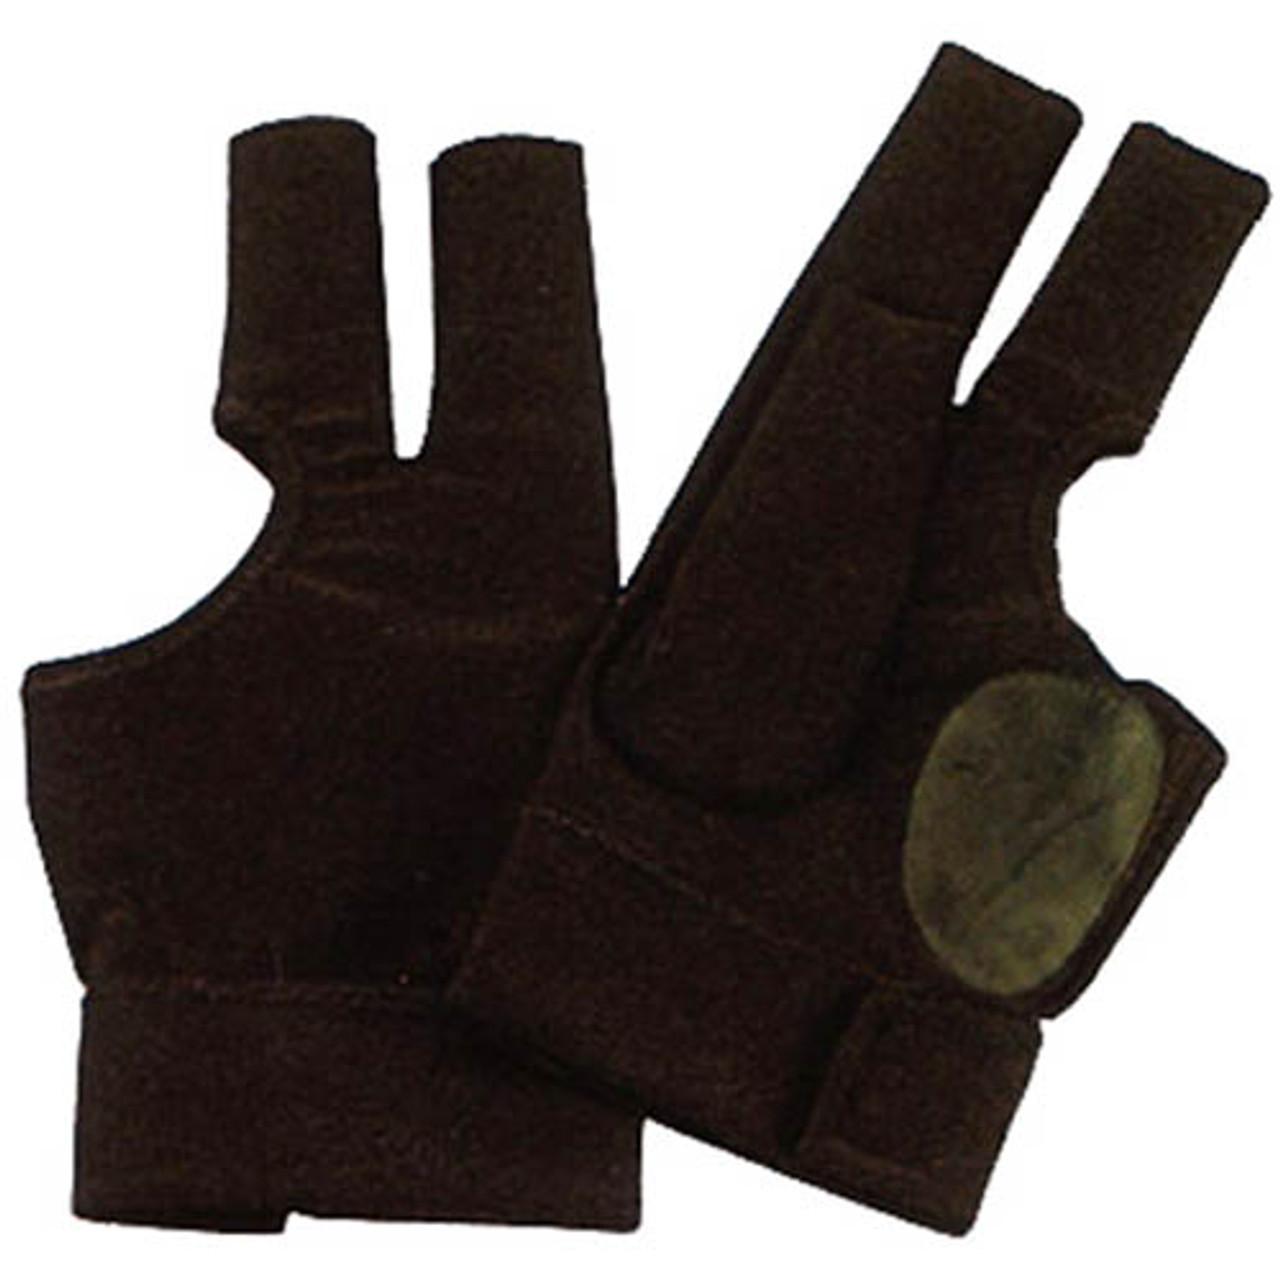 Sharpshooter Billiard Glove